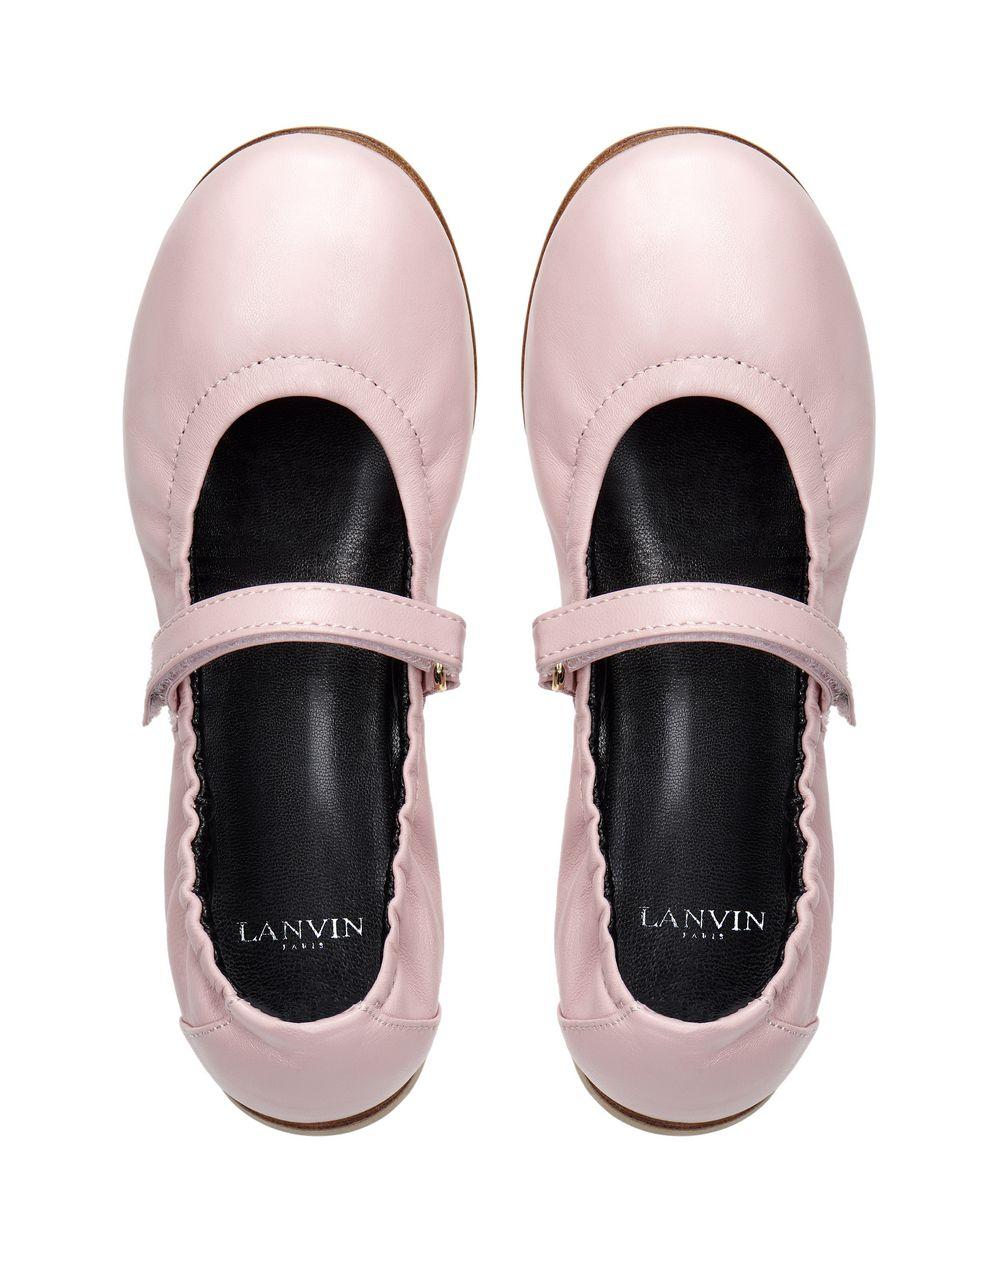 BALLERINES ROSES  - Lanvin